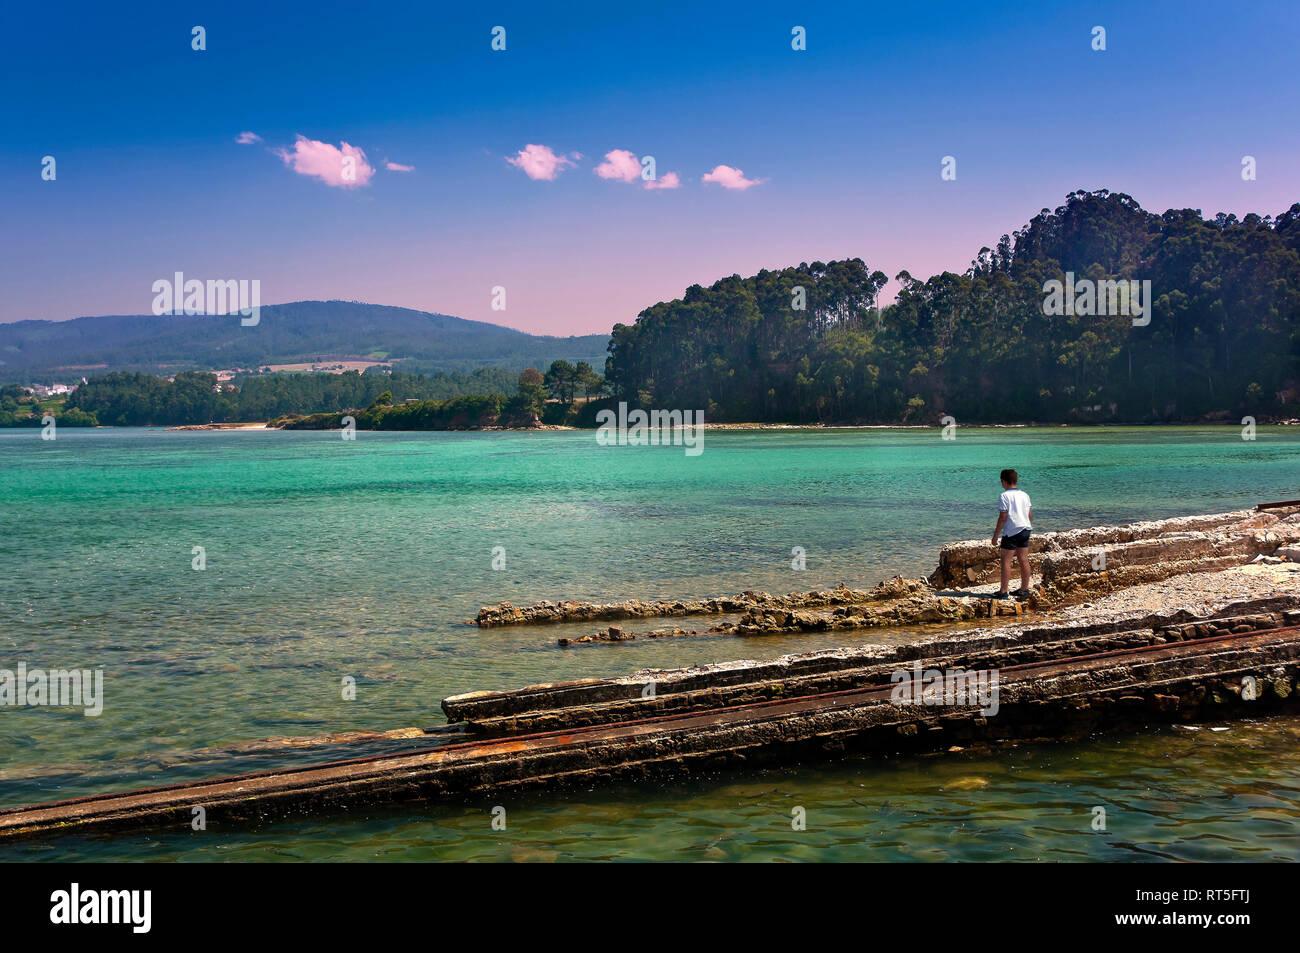 Foz estuary and old shipyard rails. Foz. Lugo province. Region of Galicia. Spain. Europe - Stock Image